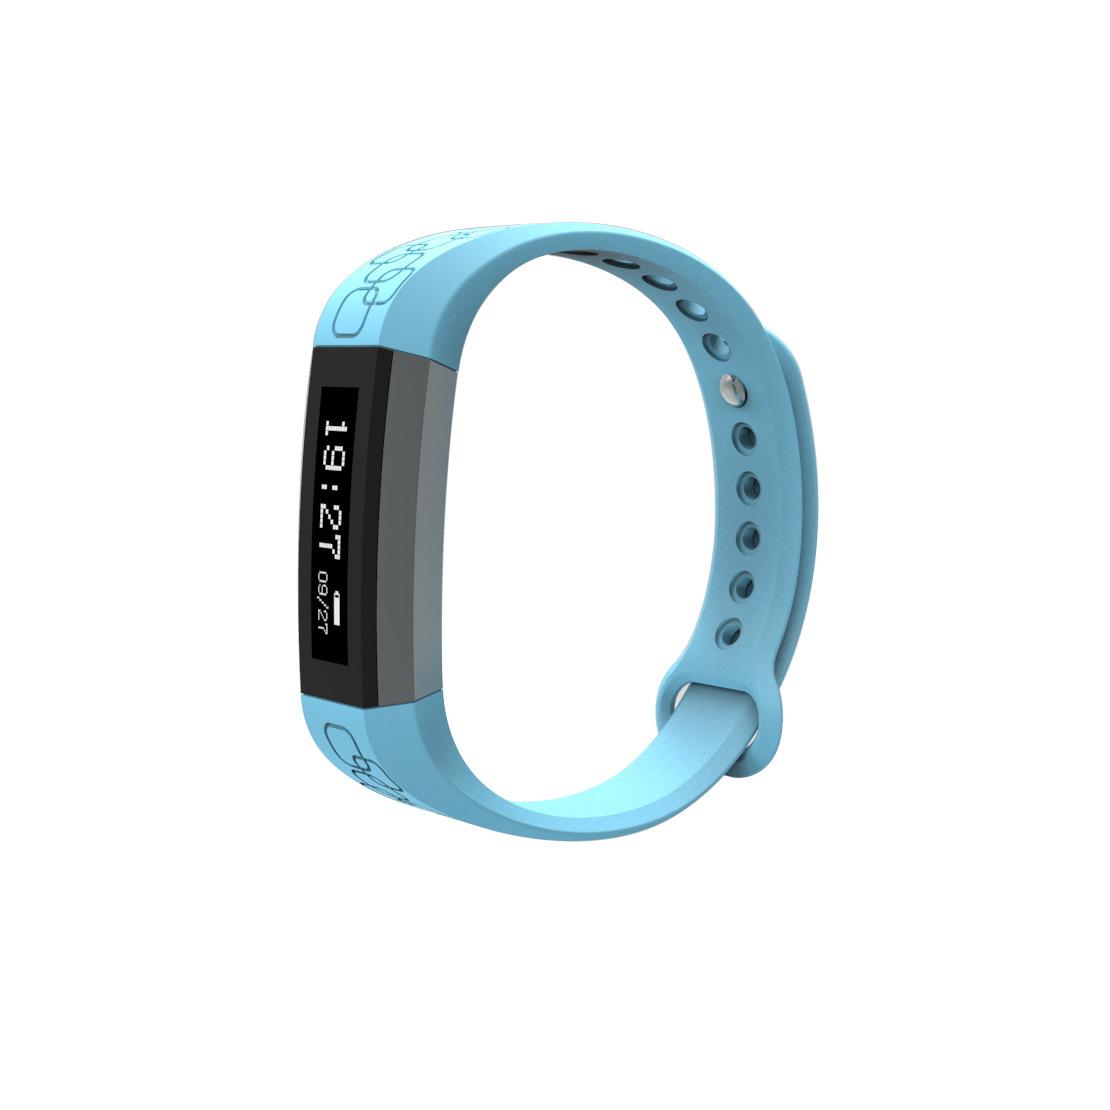 RS9005 heart rate smart bracelet